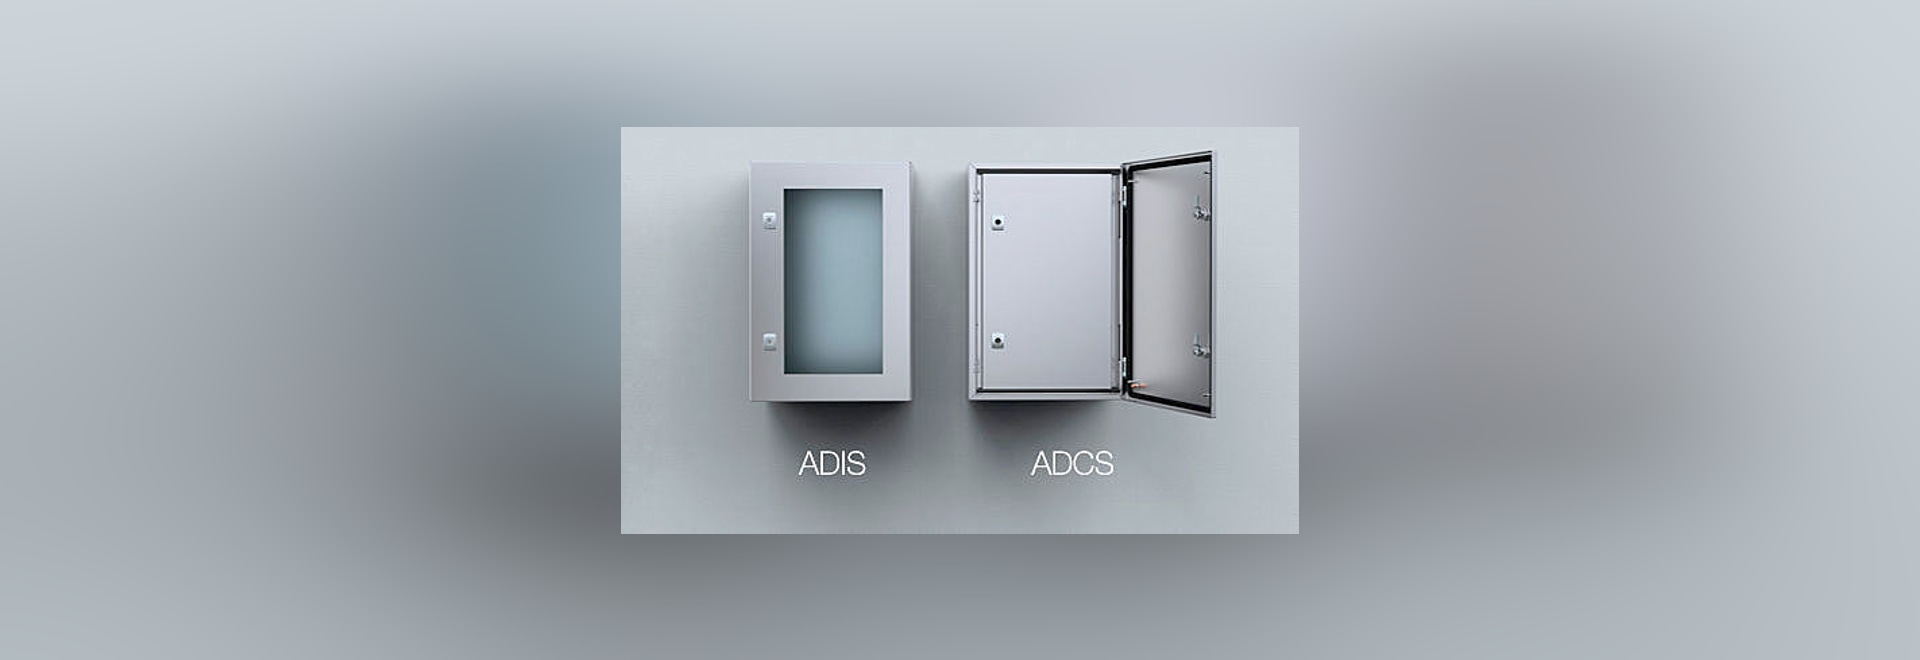 New dimensions for Eldon\'\'s clear glass doors and inner doors - ELDON